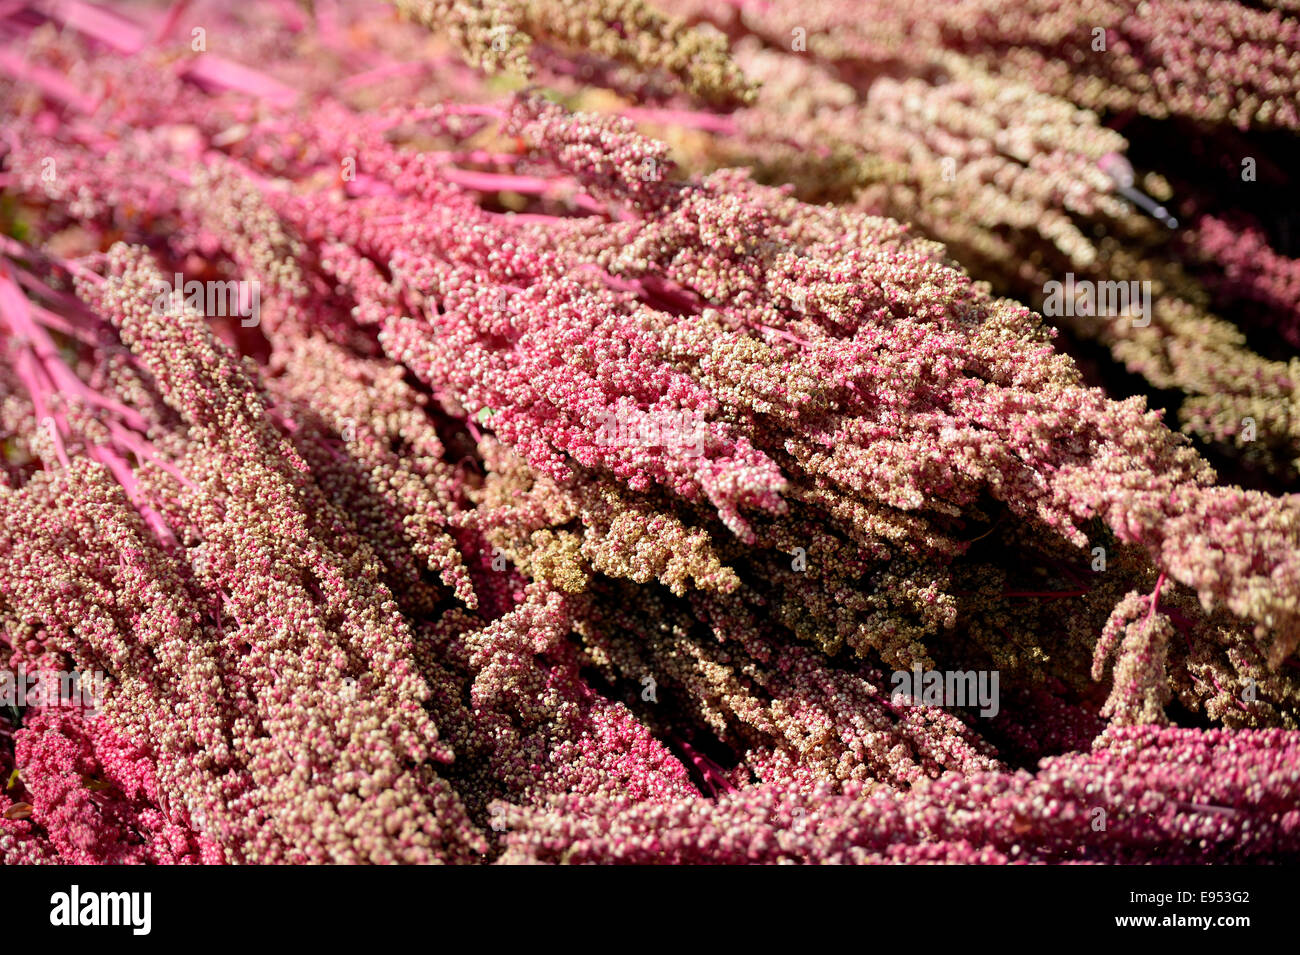 Pflanzen Trocknen pflanzen der quinoa chenopodium quinoa trocknen quivilla huanuco